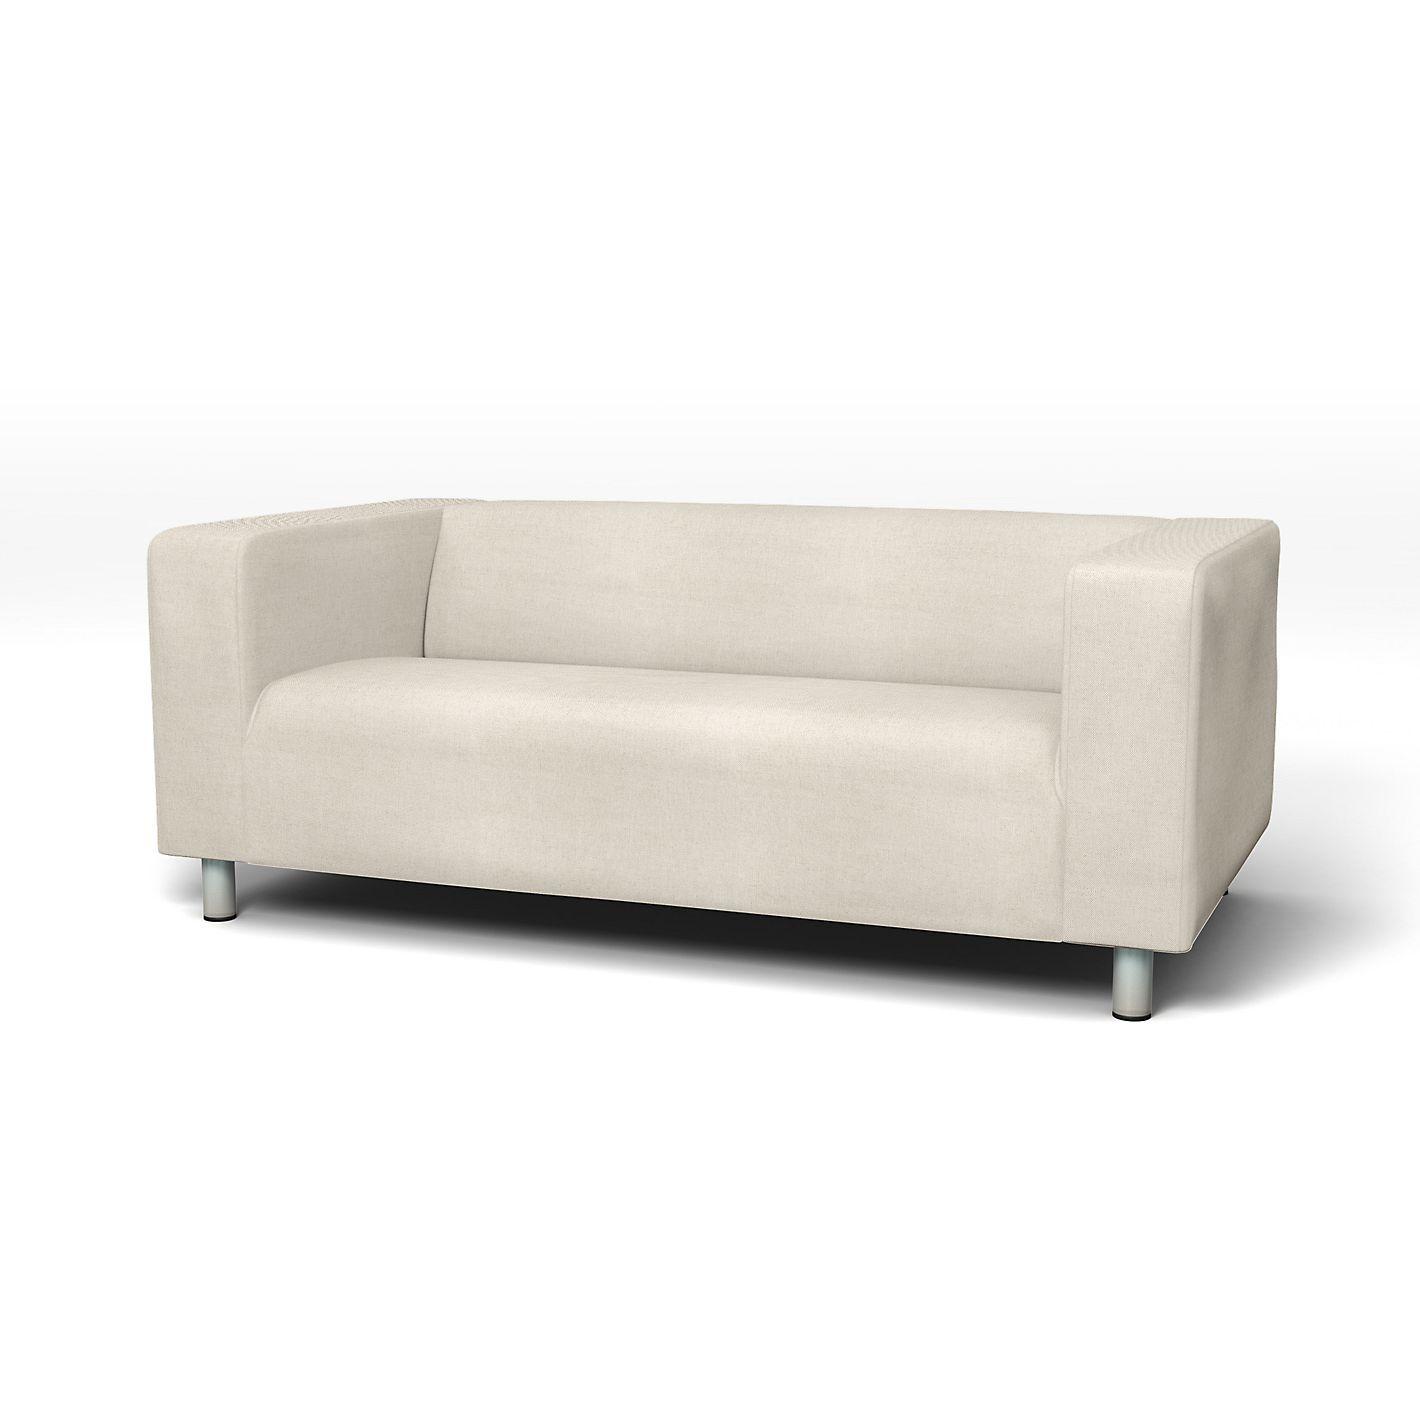 Klippan Sofa Covers 2 Seater Regular